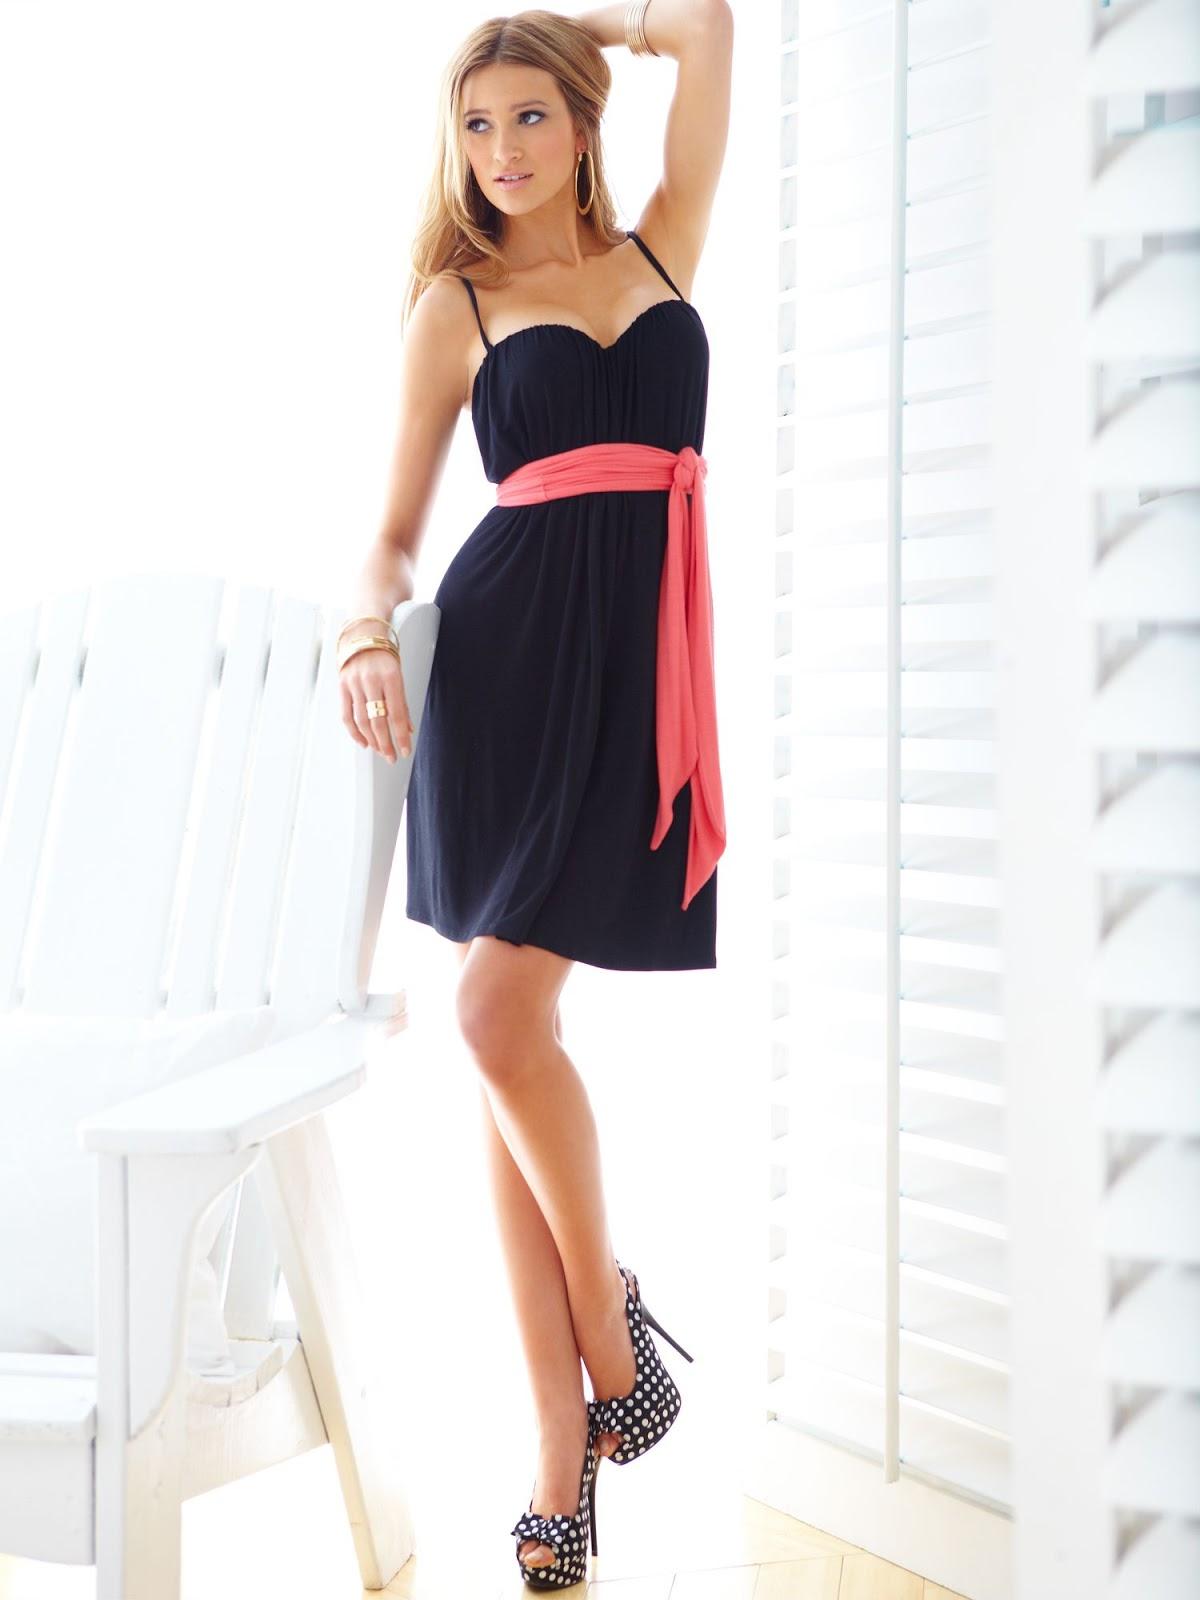 Kylie Bisutti USA 2009